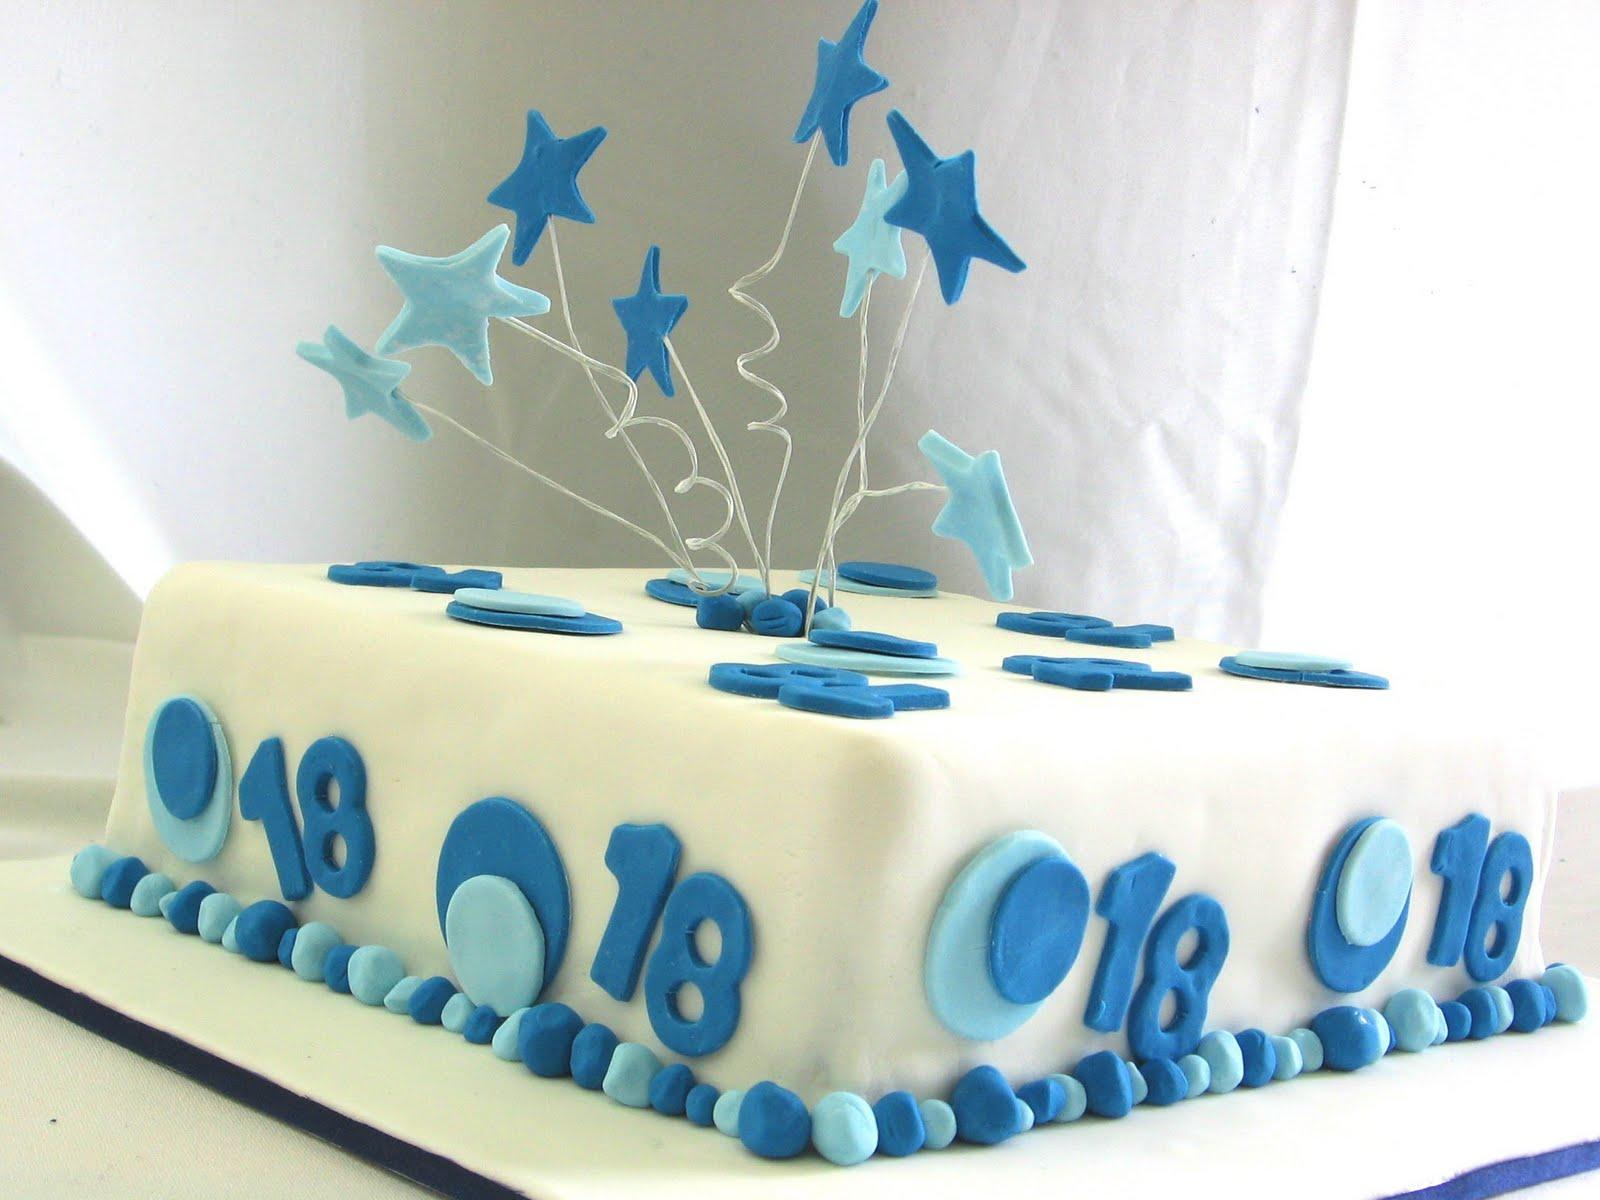 Happy Birthday Cake 18 Years Brithday Ideas For Year Old Boy